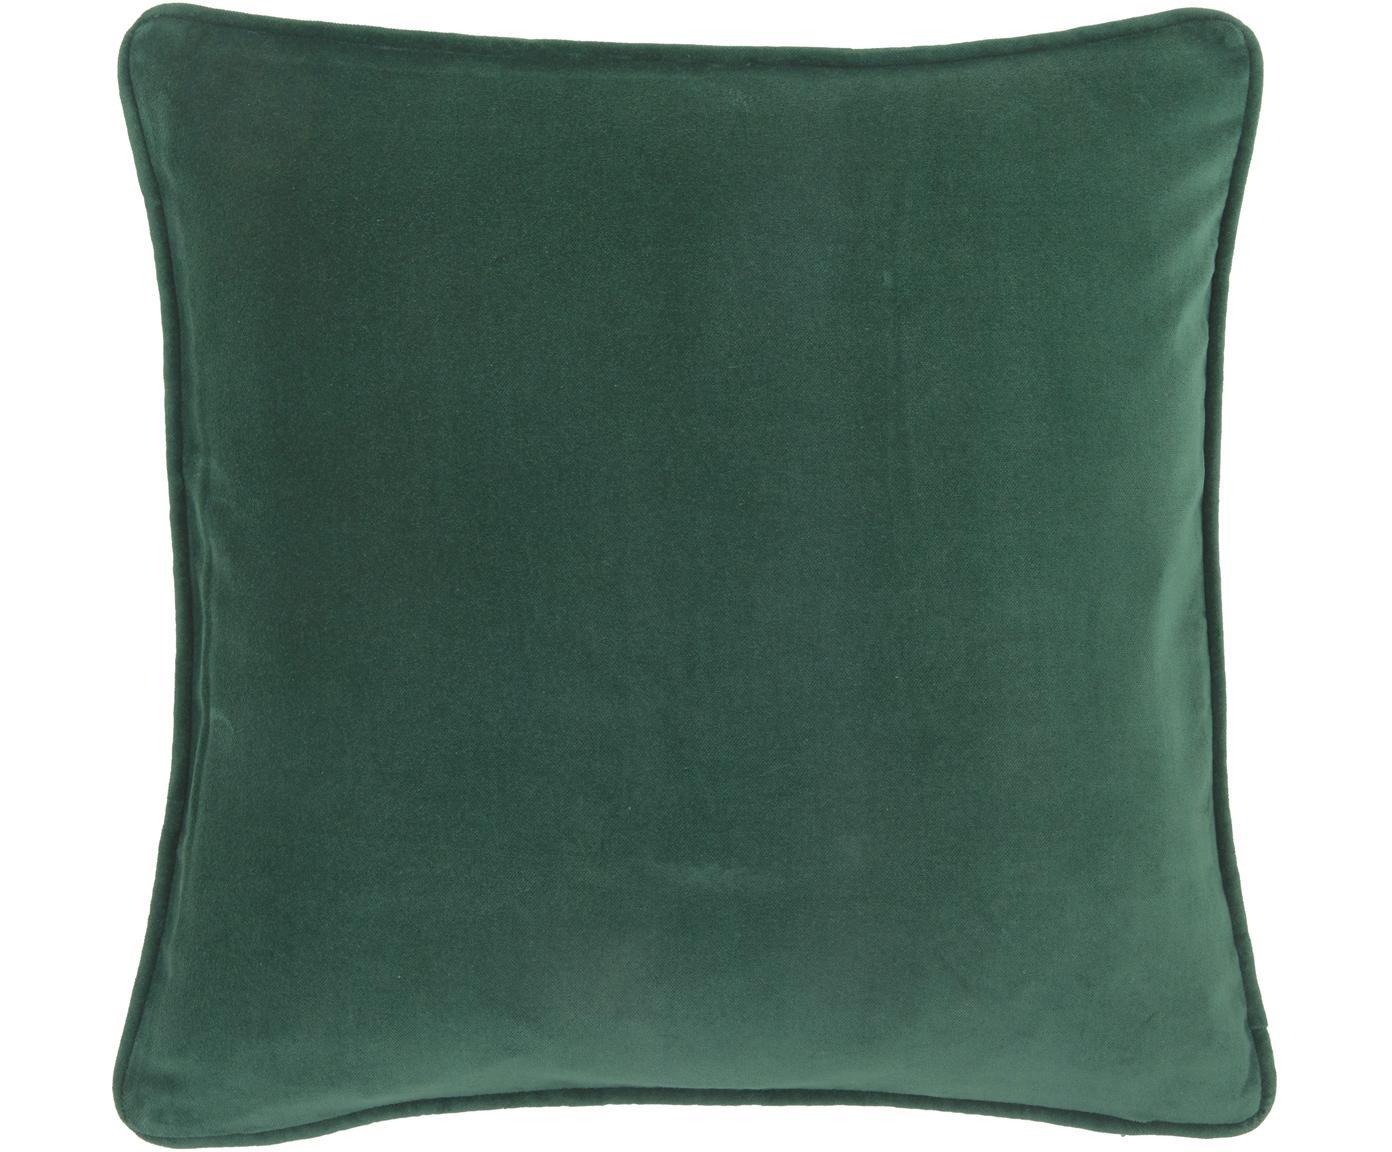 Effen fluwelen kussenhoes Dana in smaragdgroen, Katoenfluweel, Smaragdgroen, 40 x 40 cm